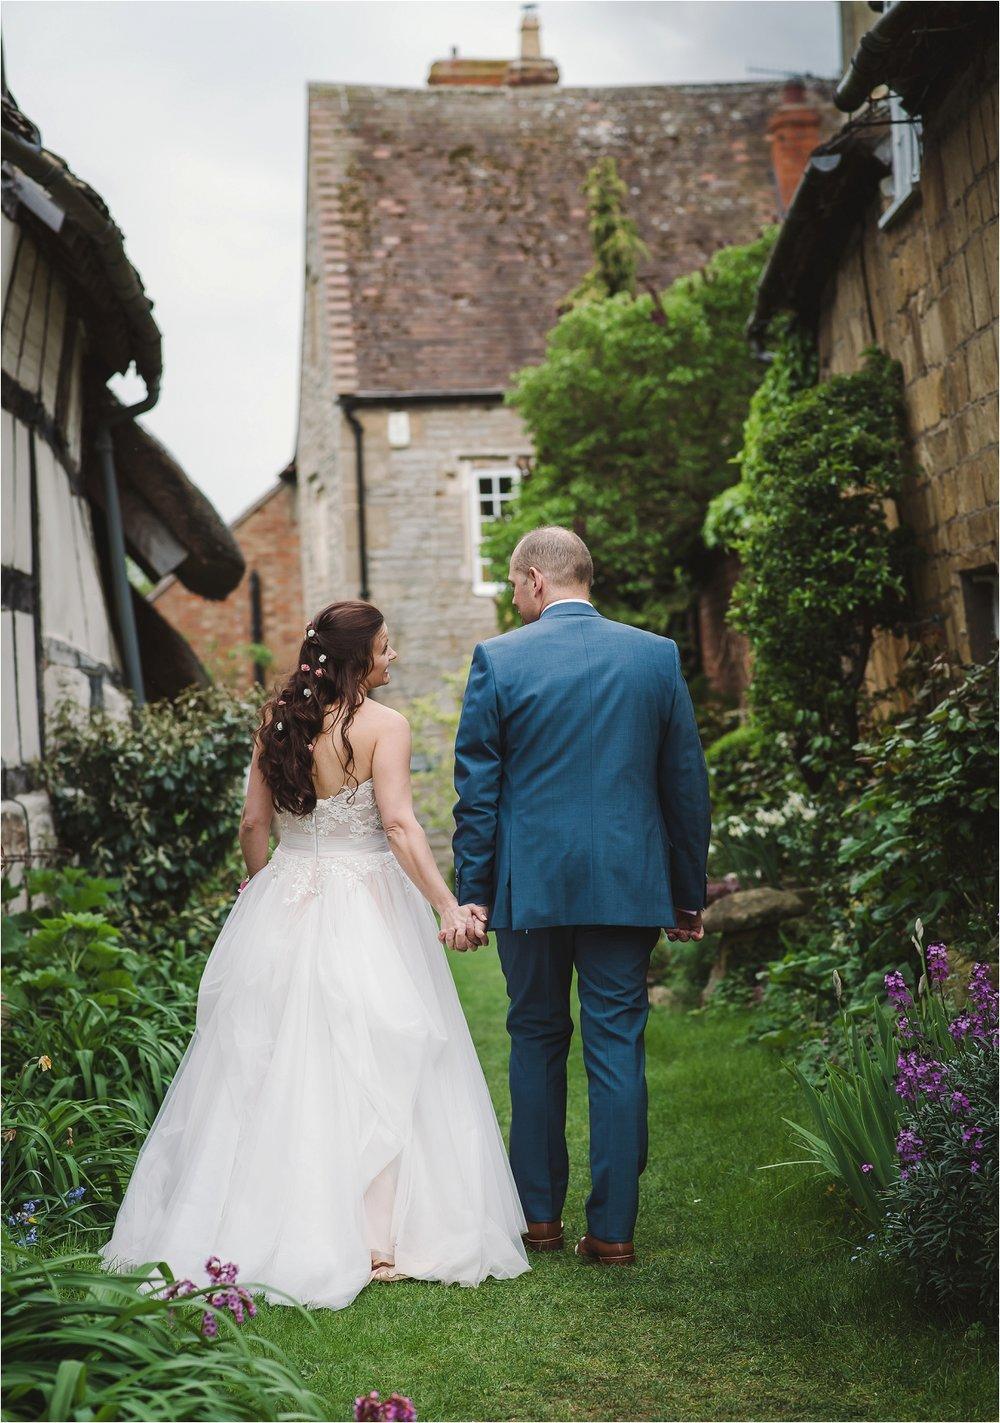 chris_emma_wedding_the_Fleece_inn_0075.jpg